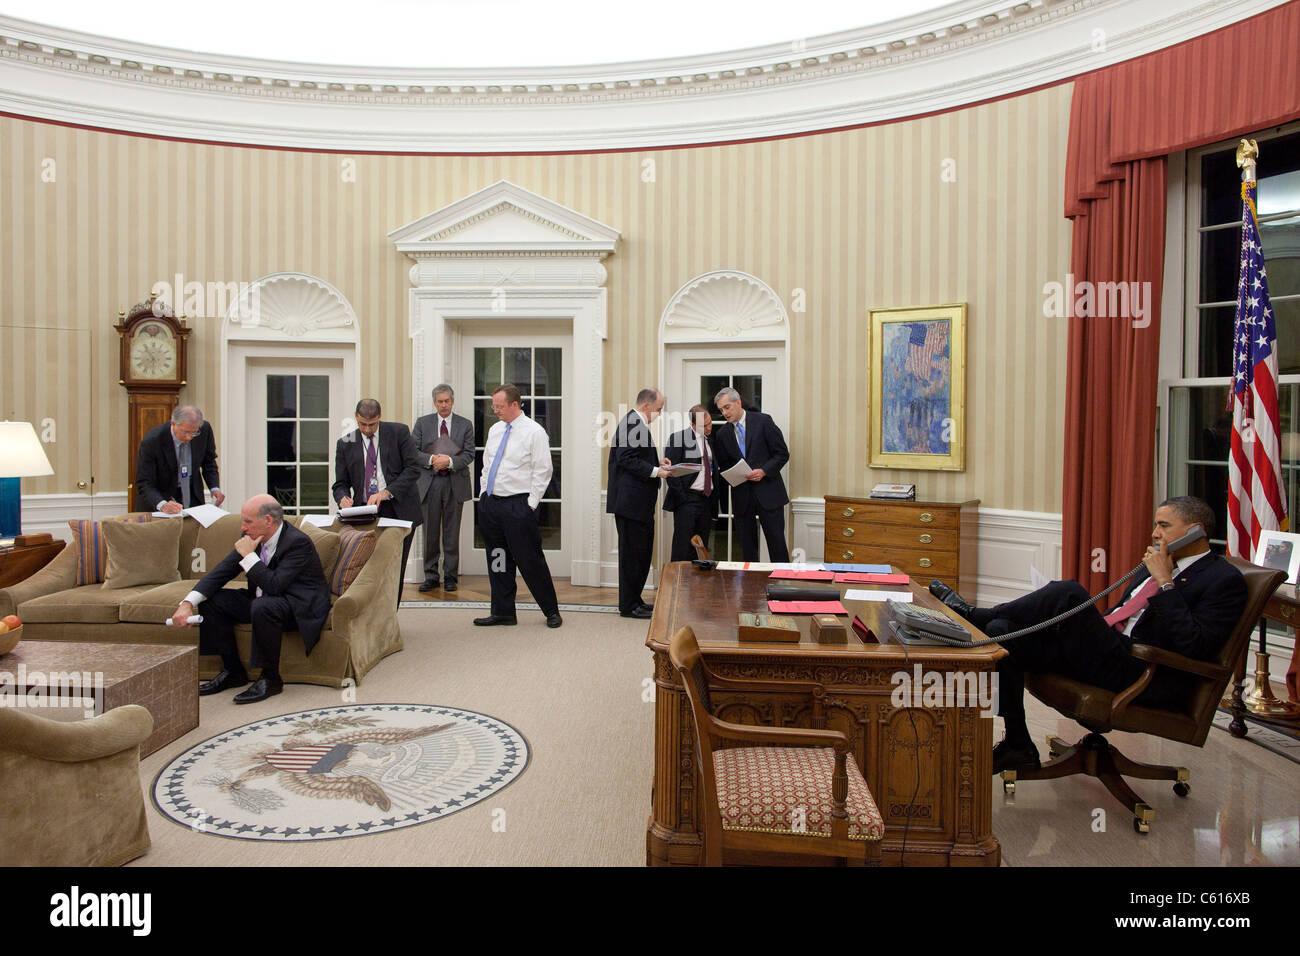 Präsident Obama spricht am Telefon mit ägyptischen Präsidenten Hosni Mubarak als leitende Angestellte Stockbild